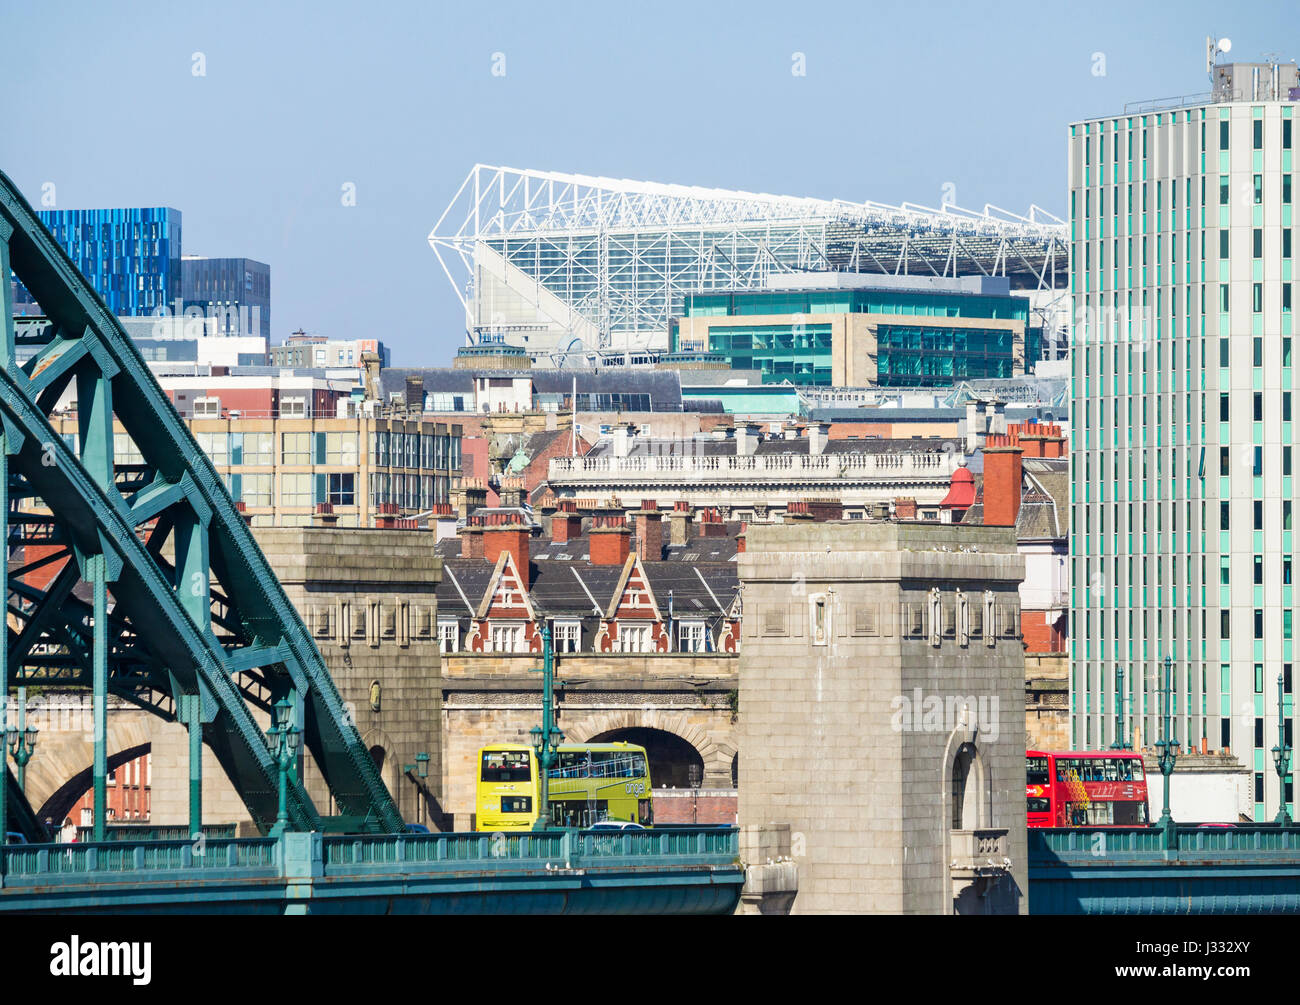 Newcastle: View over Tyne Bridge and city centre towards St James` park football stadium. Newcastle upon Tyne, England, Stock Photo